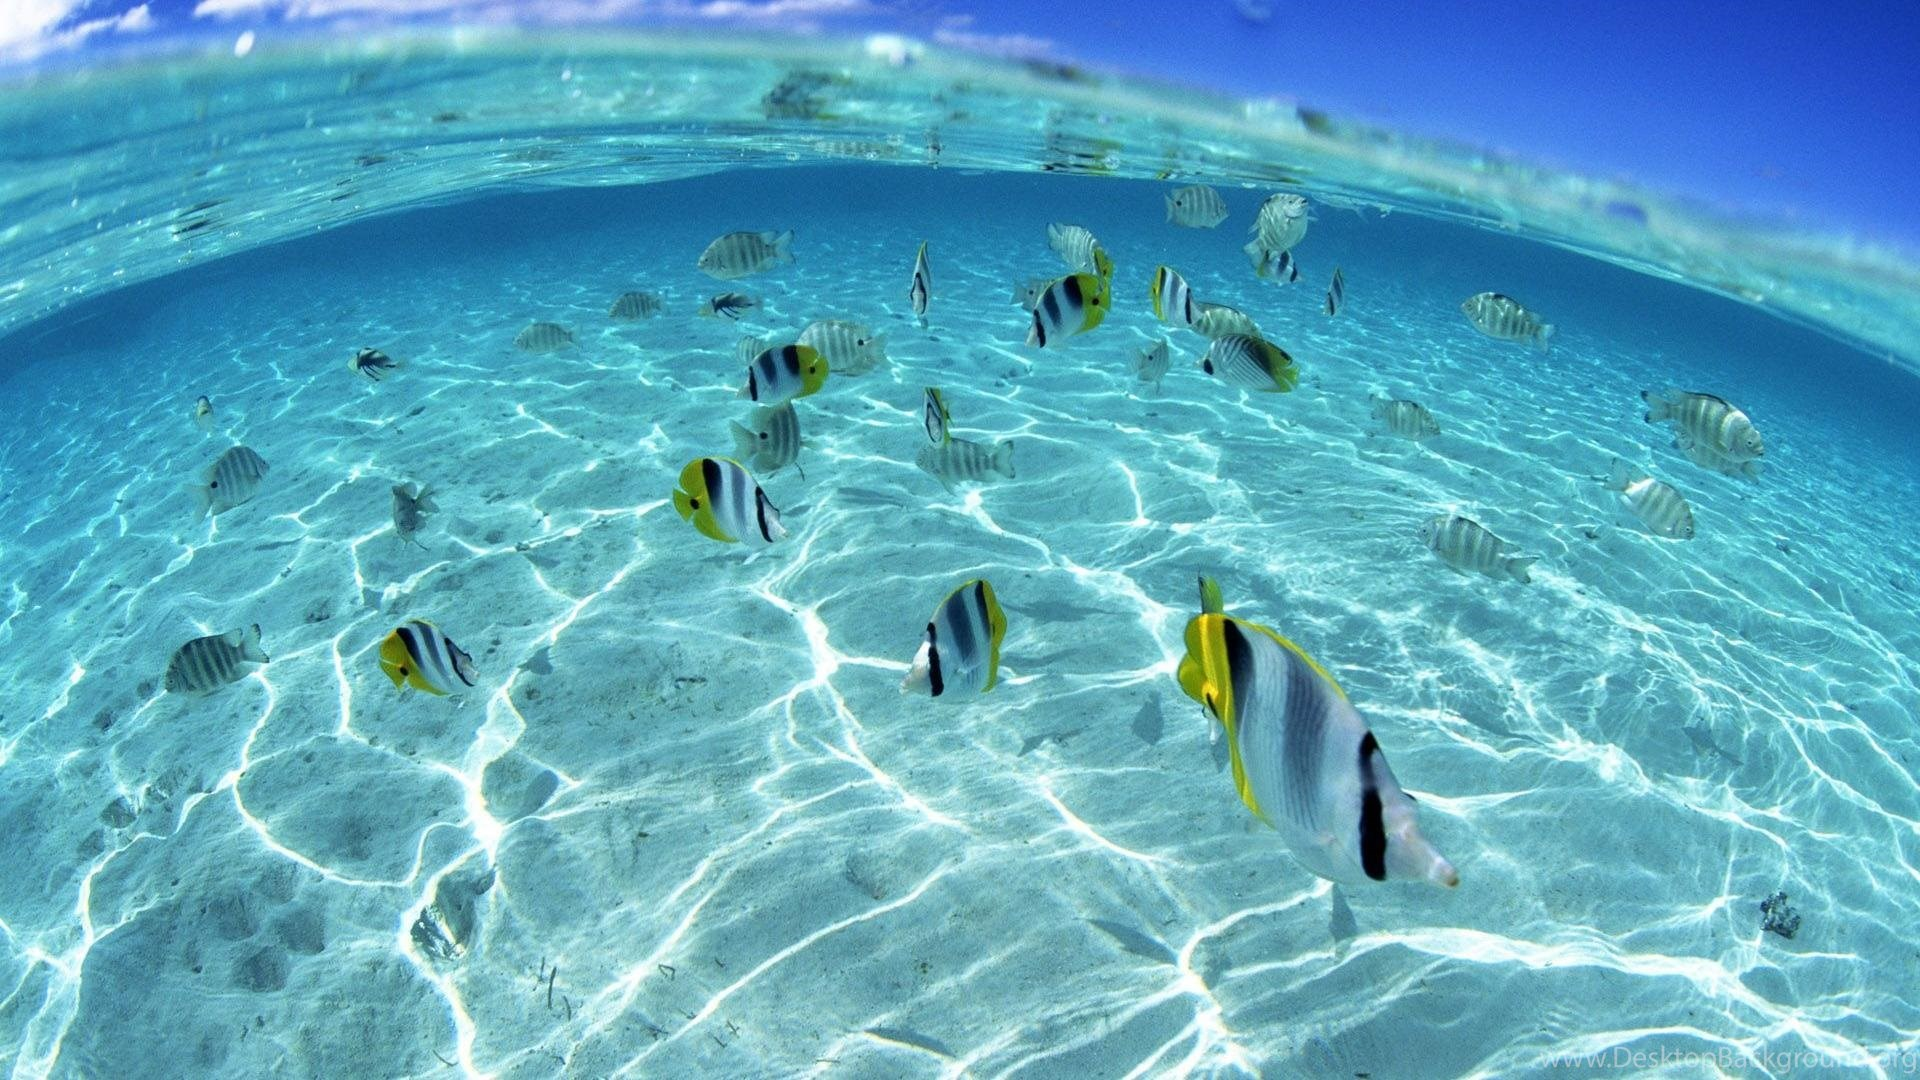 Underwater Wallpapers 3117 HD Wallnos Desktop Background